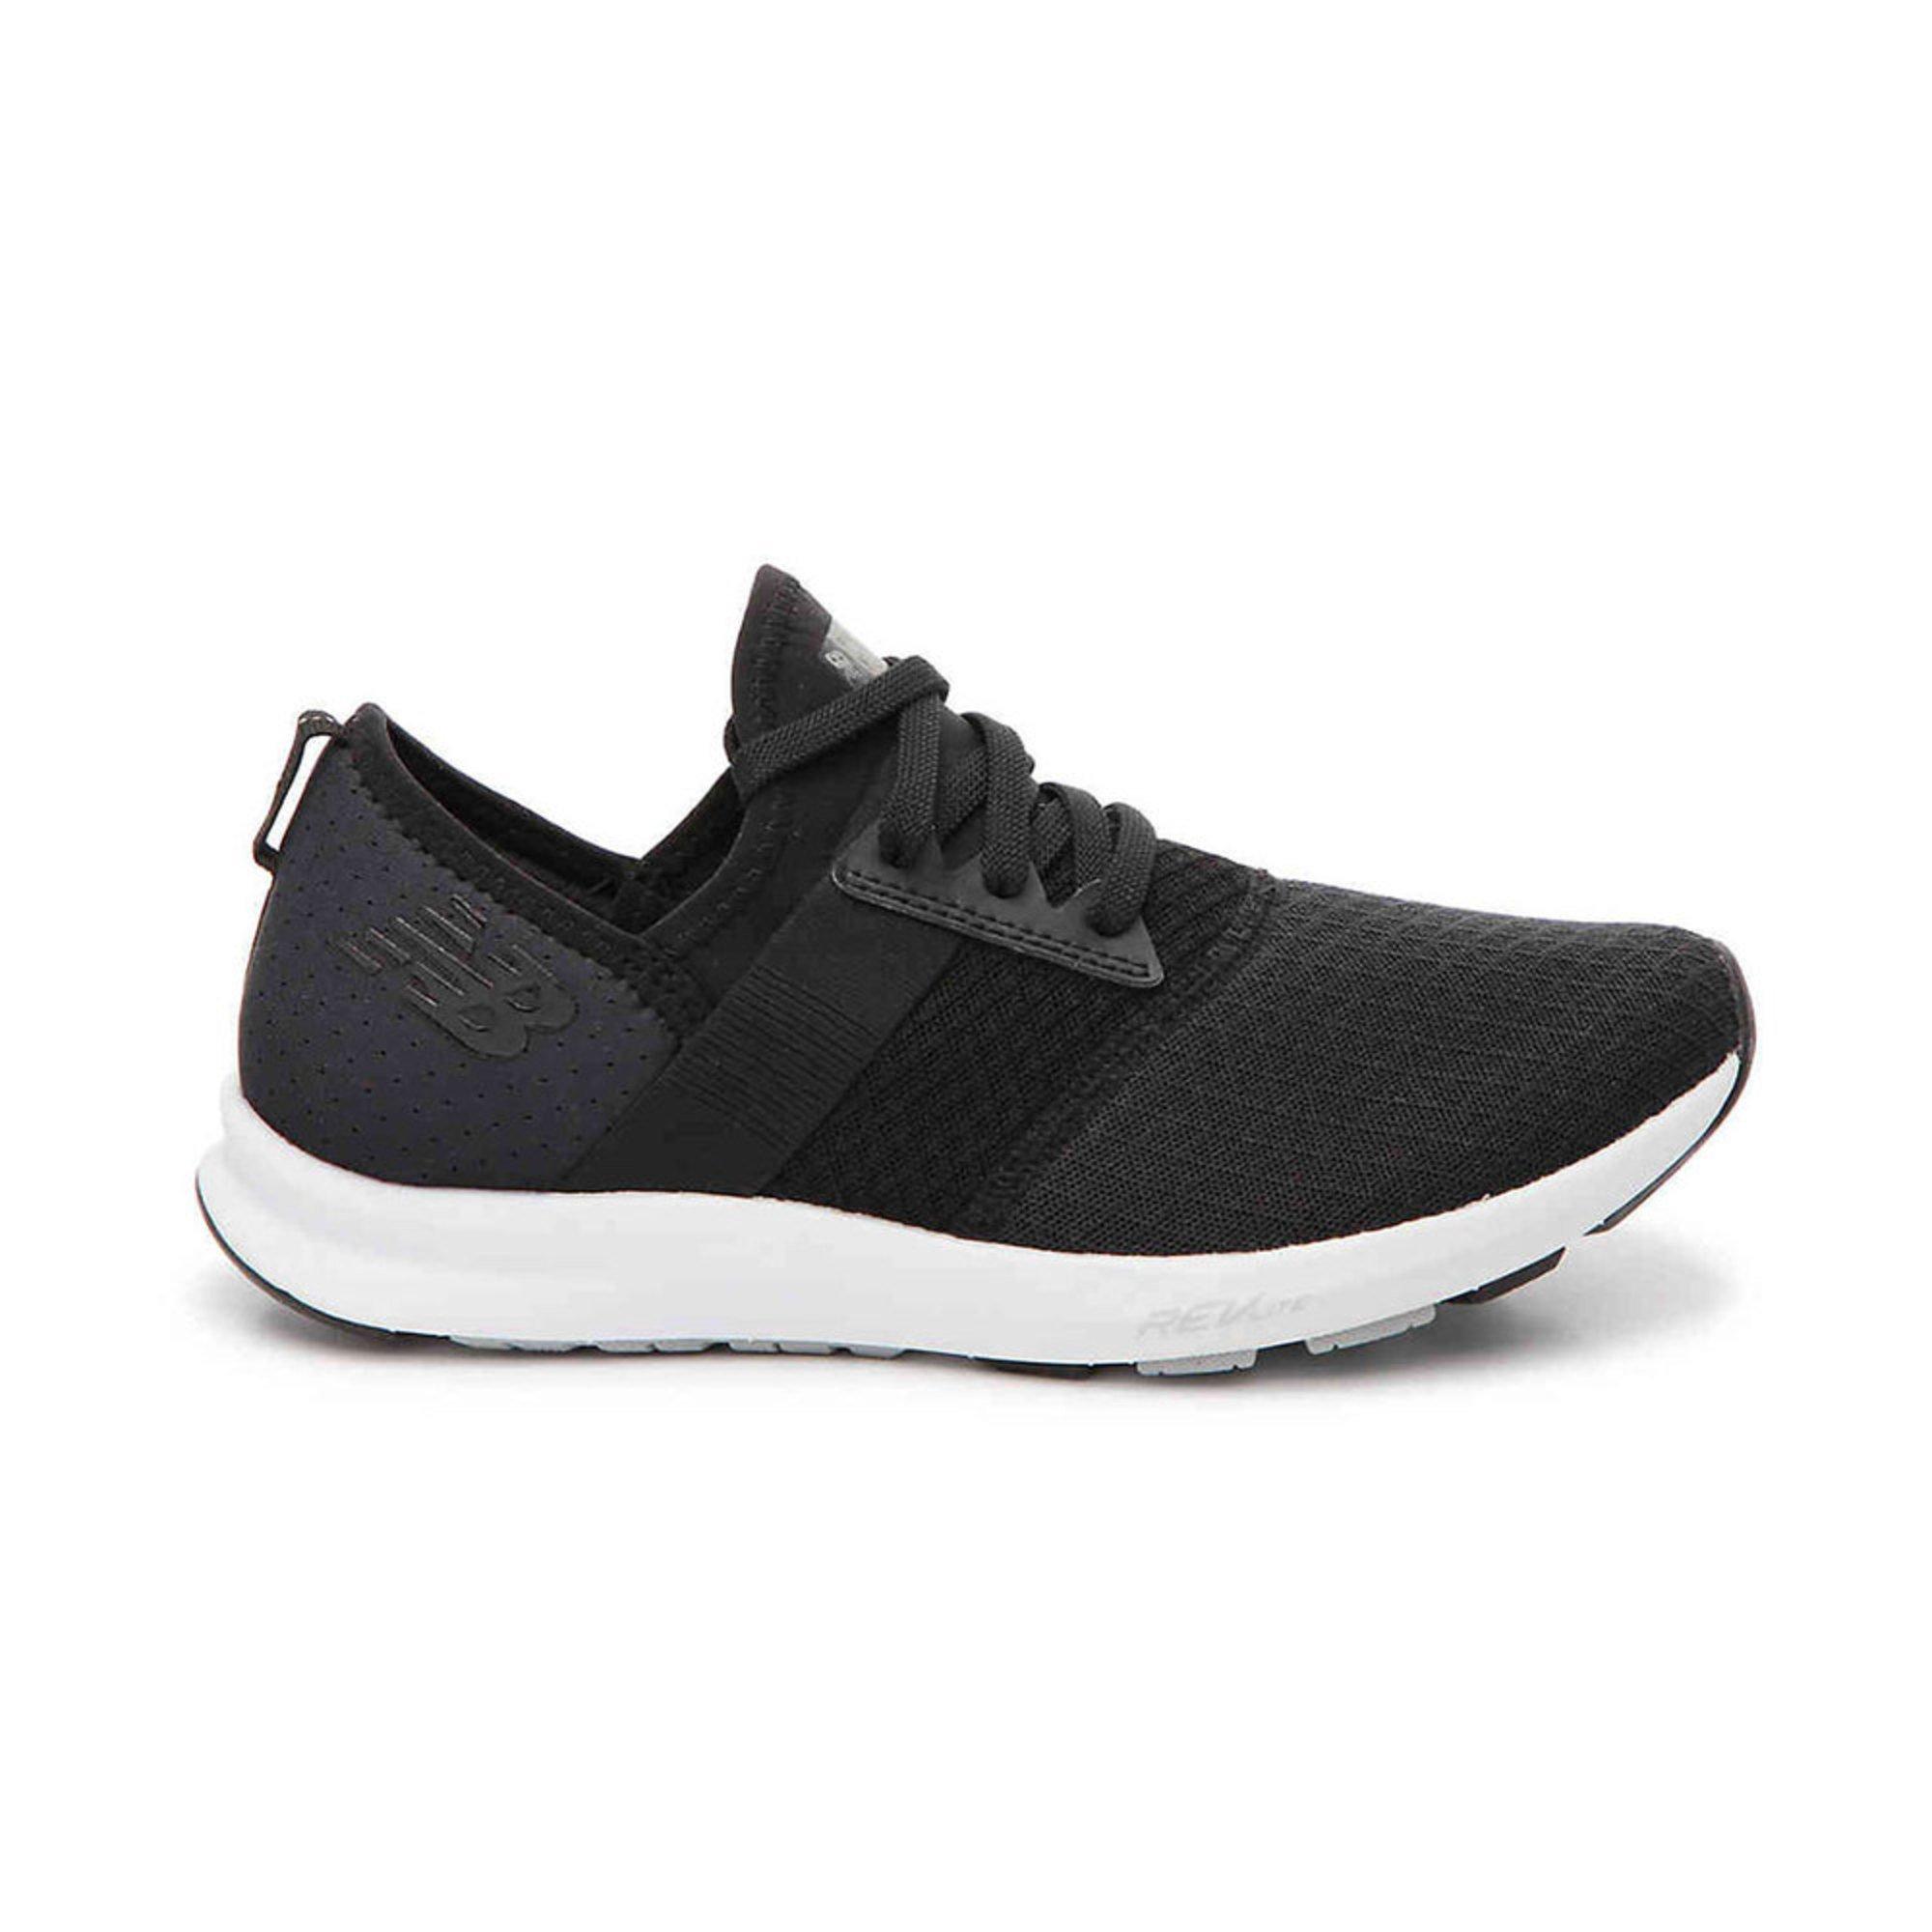 03f2cf6797 New Balance Women's Fuelcore Nergize Training Shoe | Women's ...